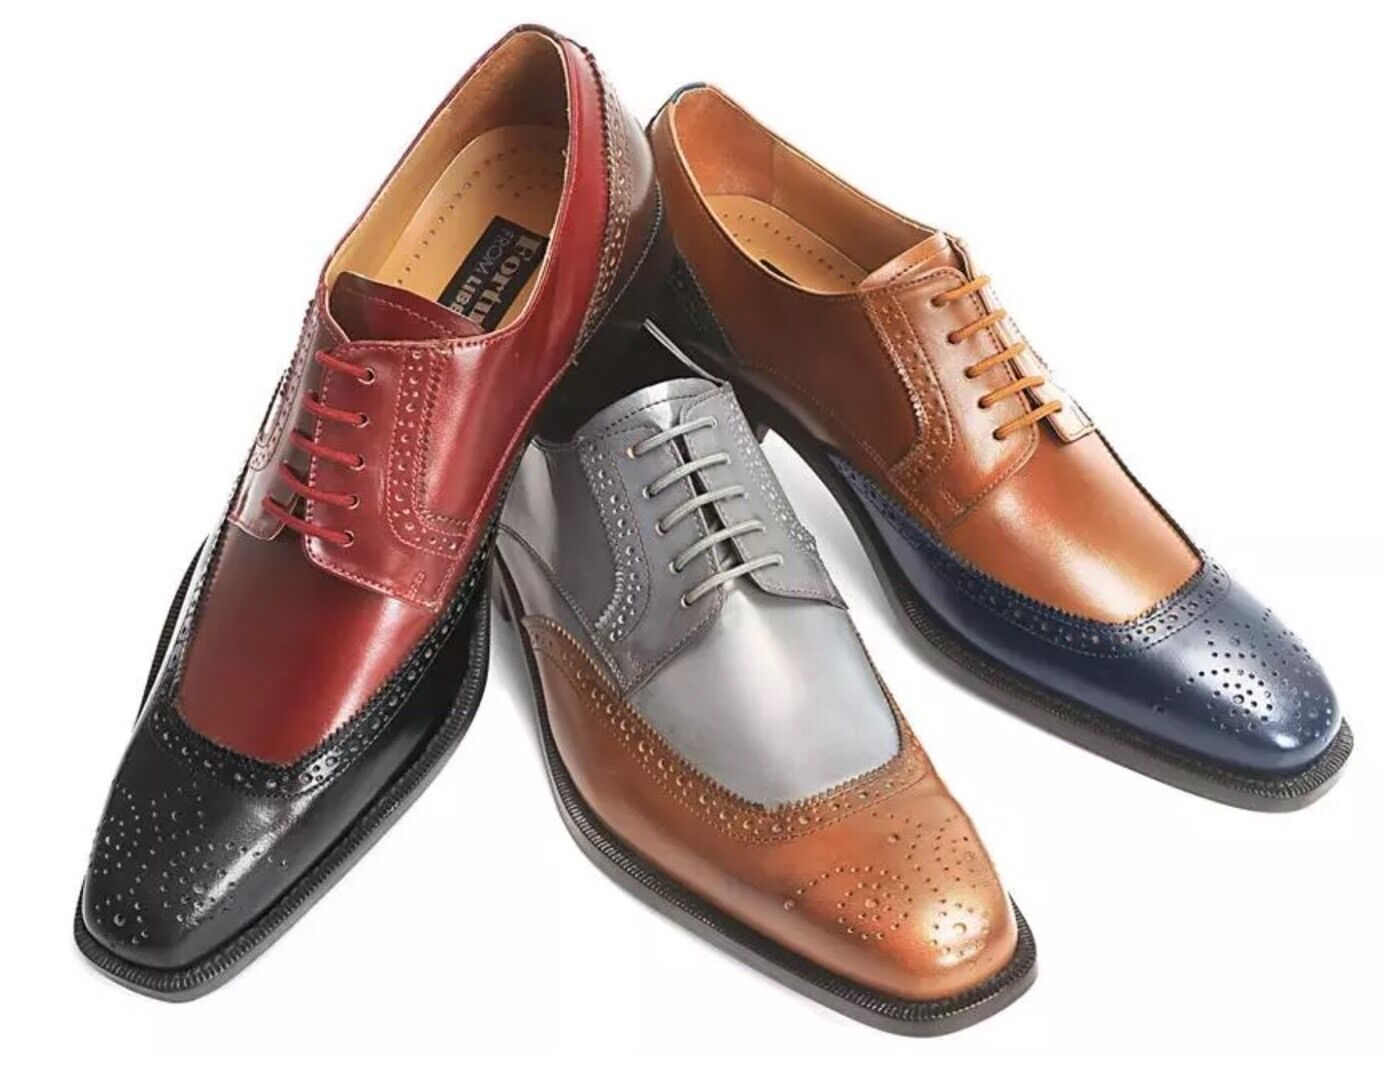 Neu Herren Liberty Leder Zweiton Formelle Schuhe Hellbraun Grau, Blk